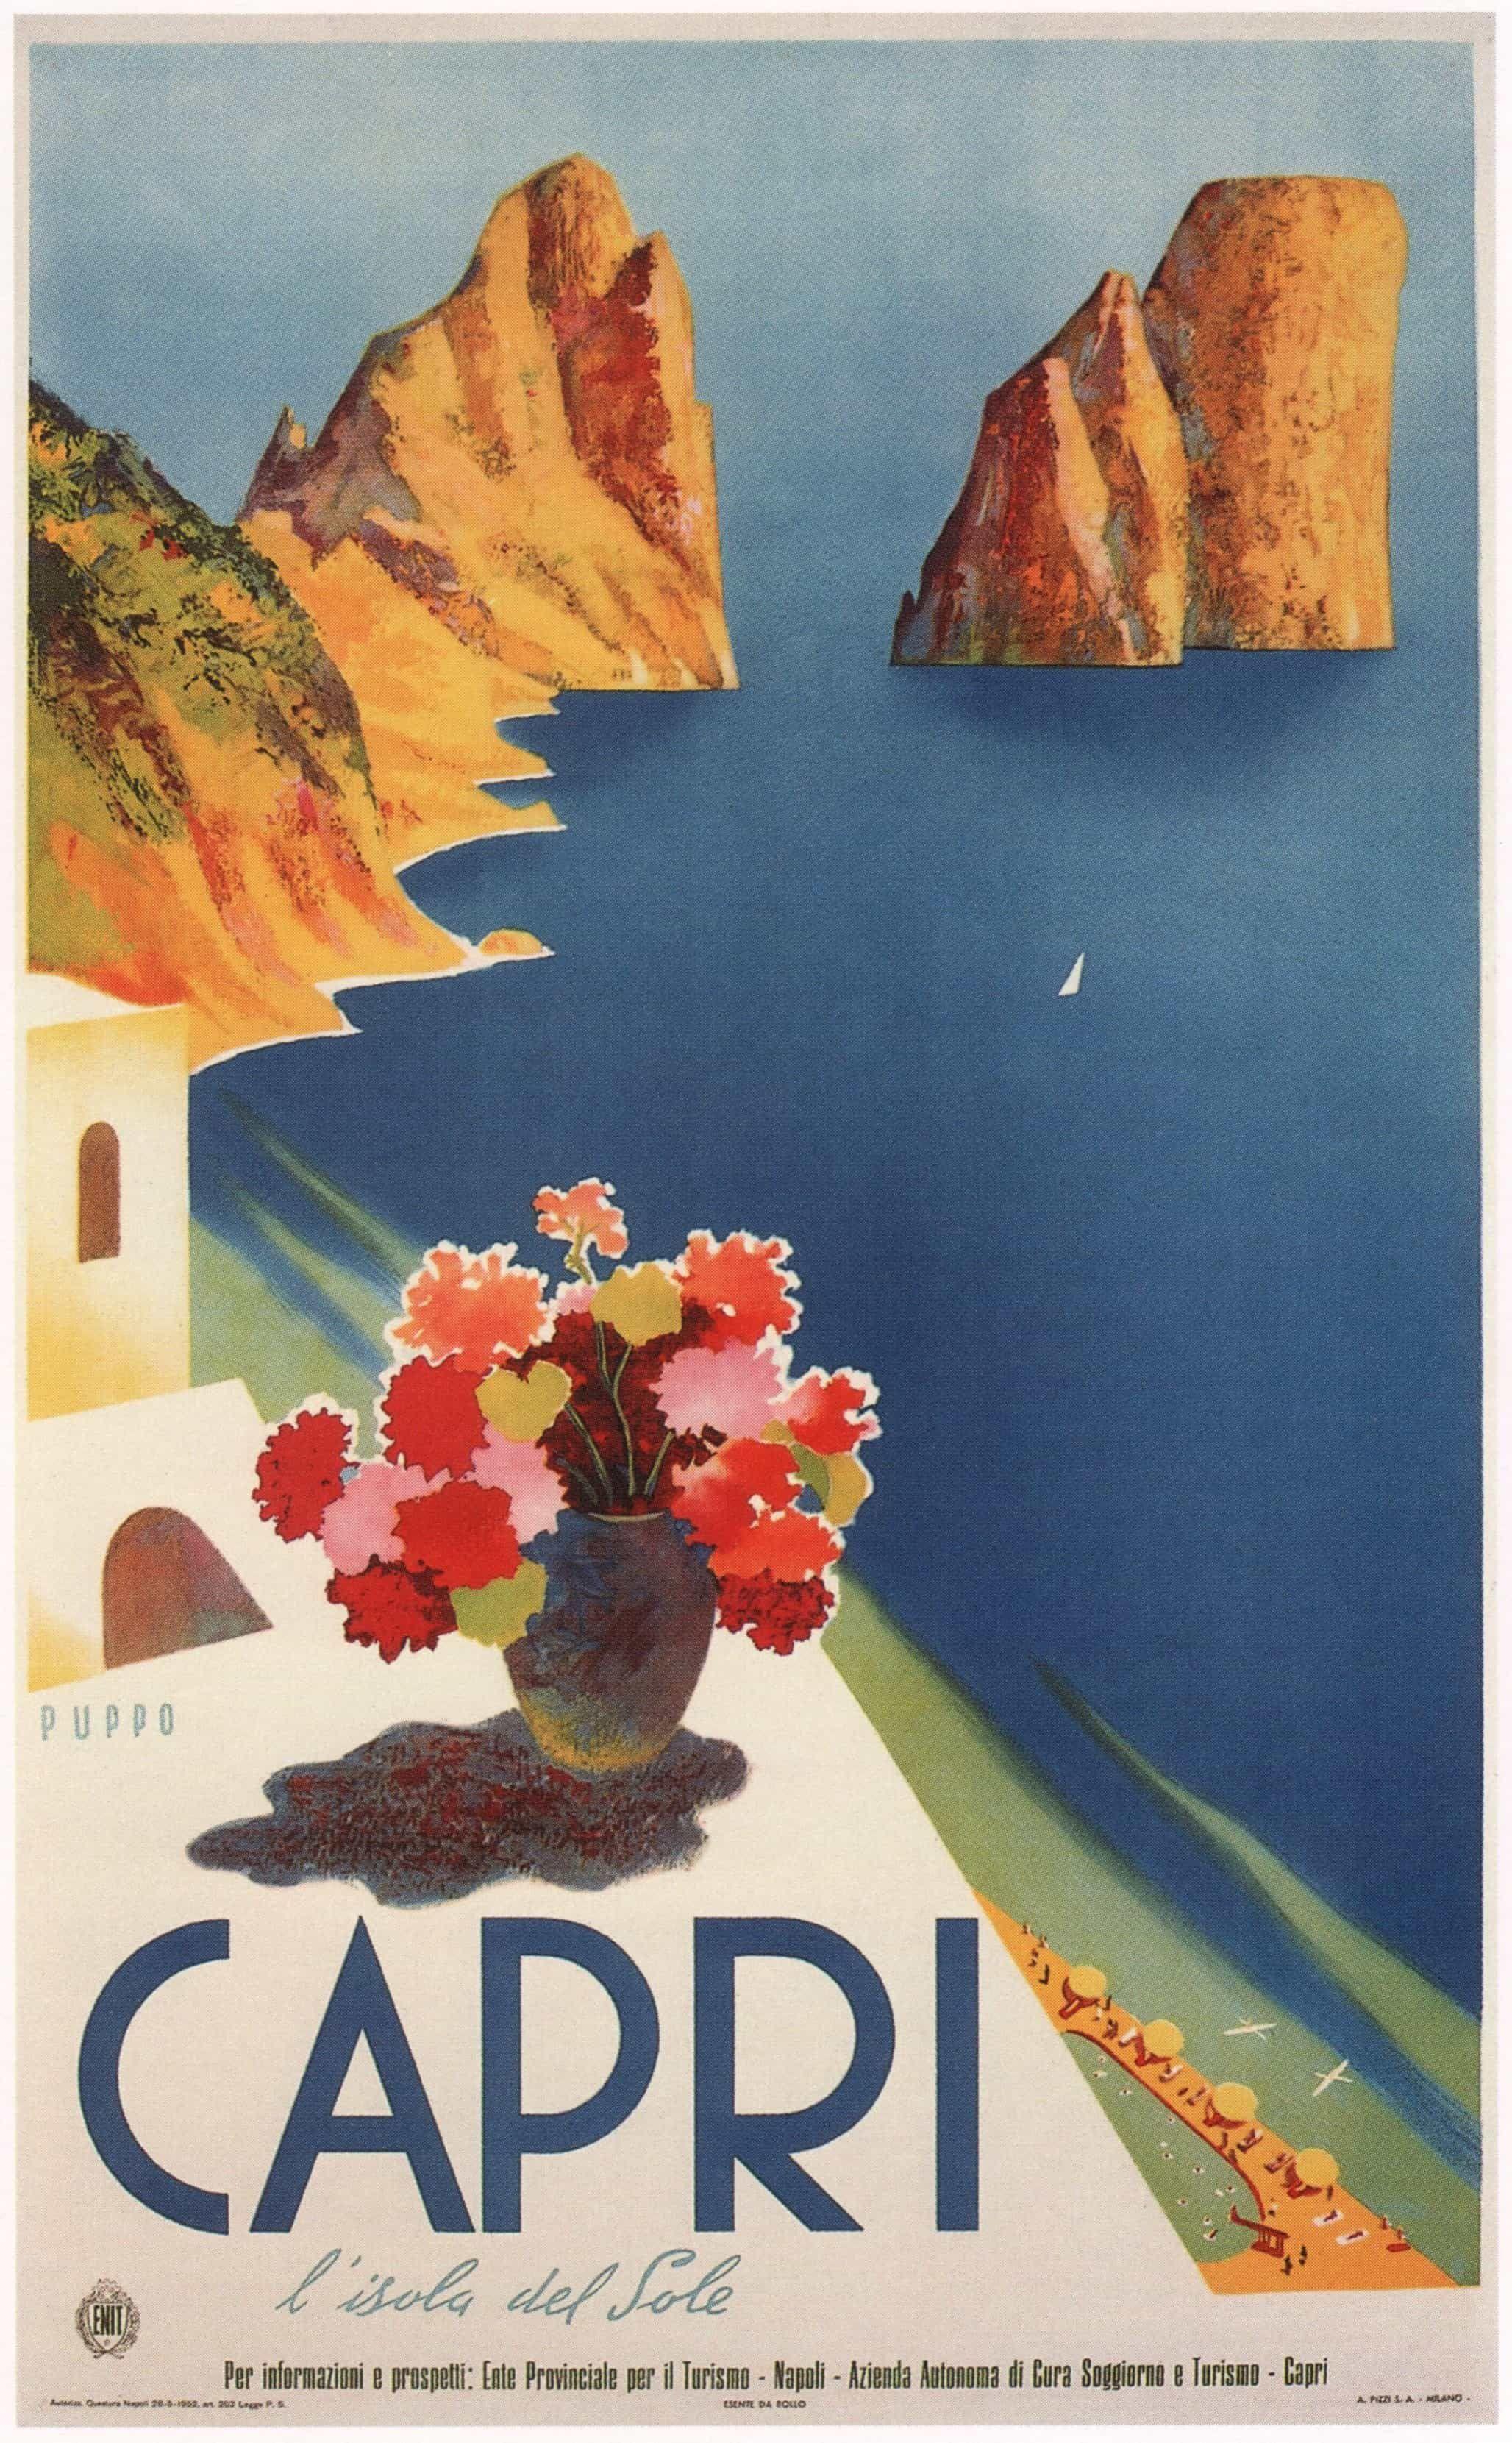 Vintage Tourism Capri Italy Poster circa 1952 | Vintage Posters ...